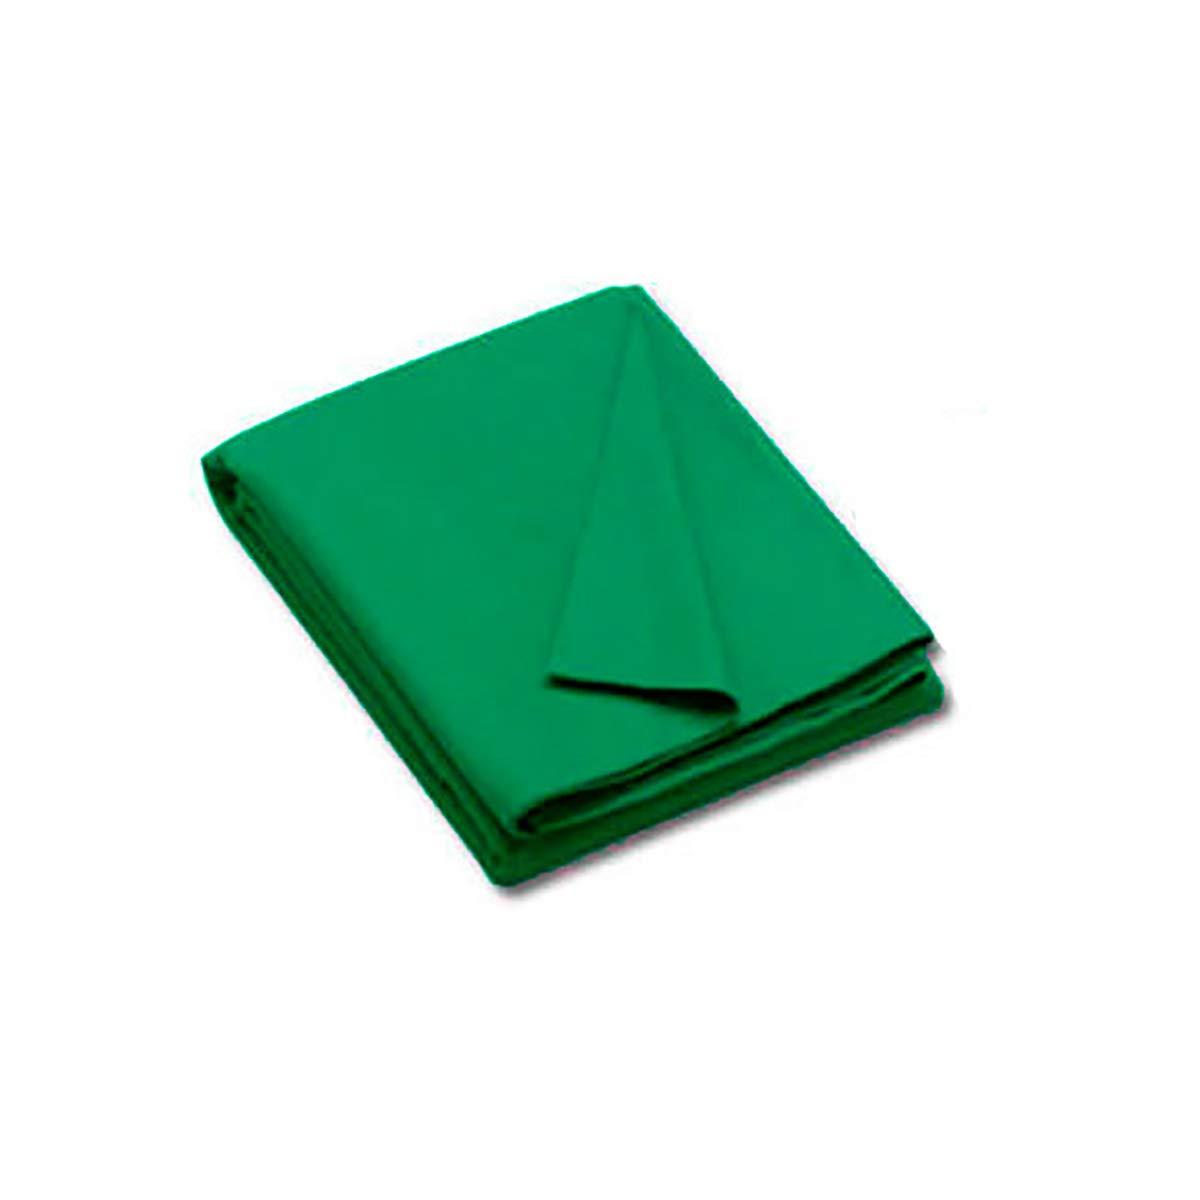 Tournament Green 7ft Pool Table Felt